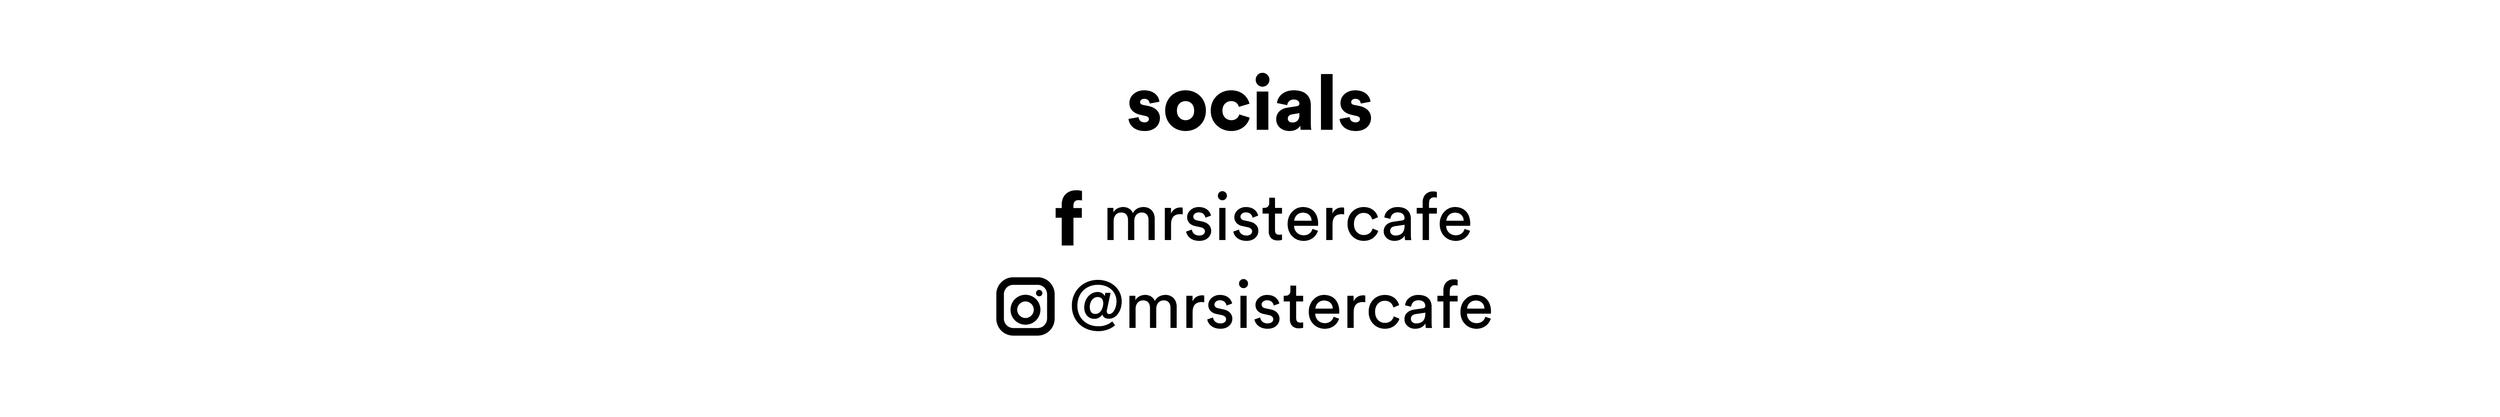 socials sister.png